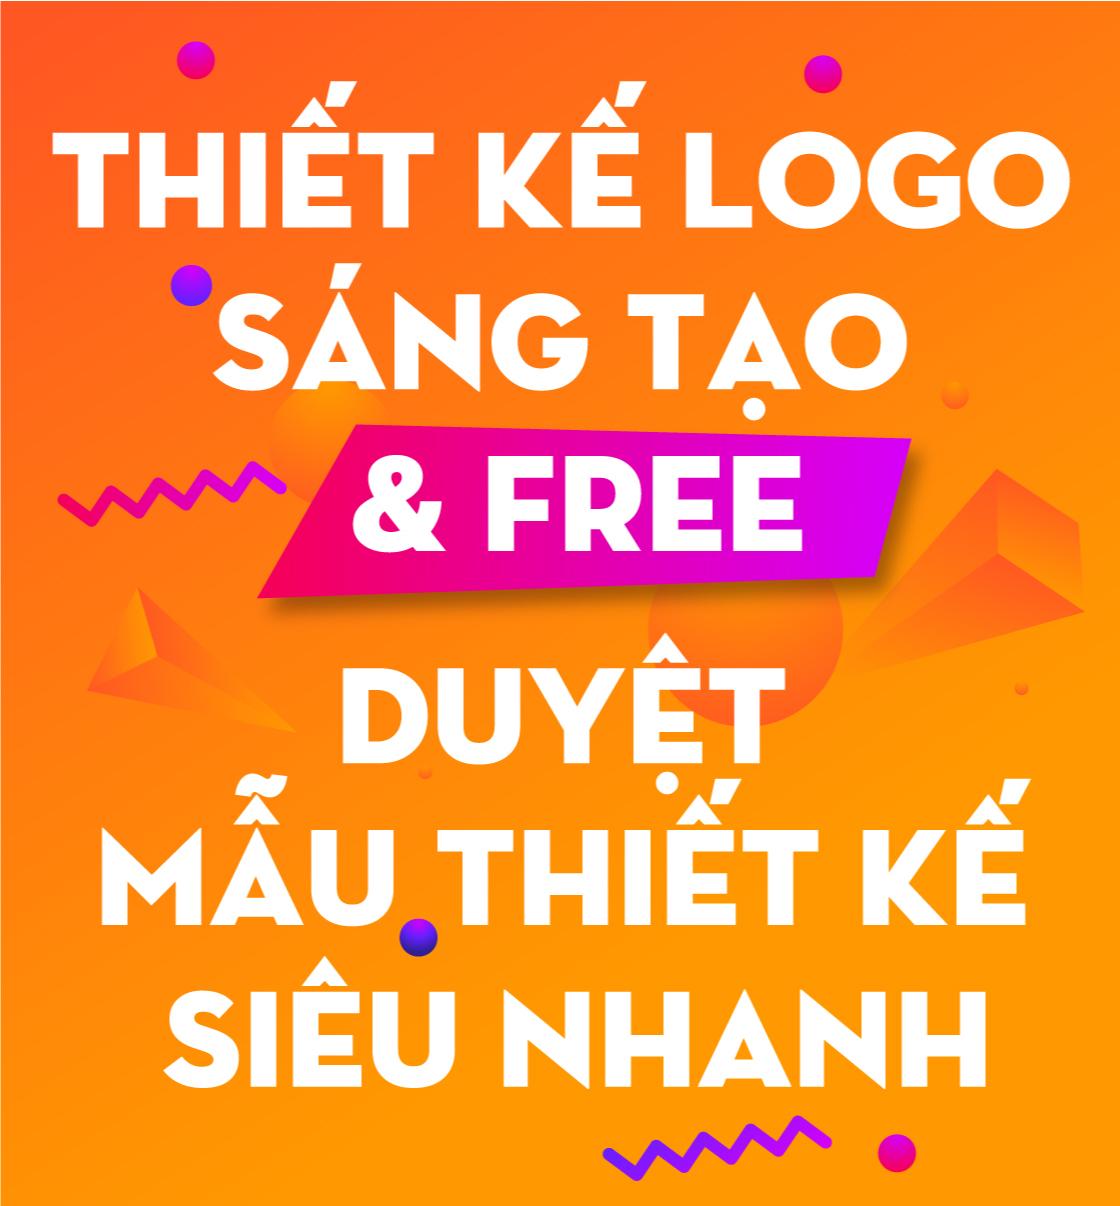 thiet-ke-logo-sang-tao-duyet-mau-sieu-nhanh